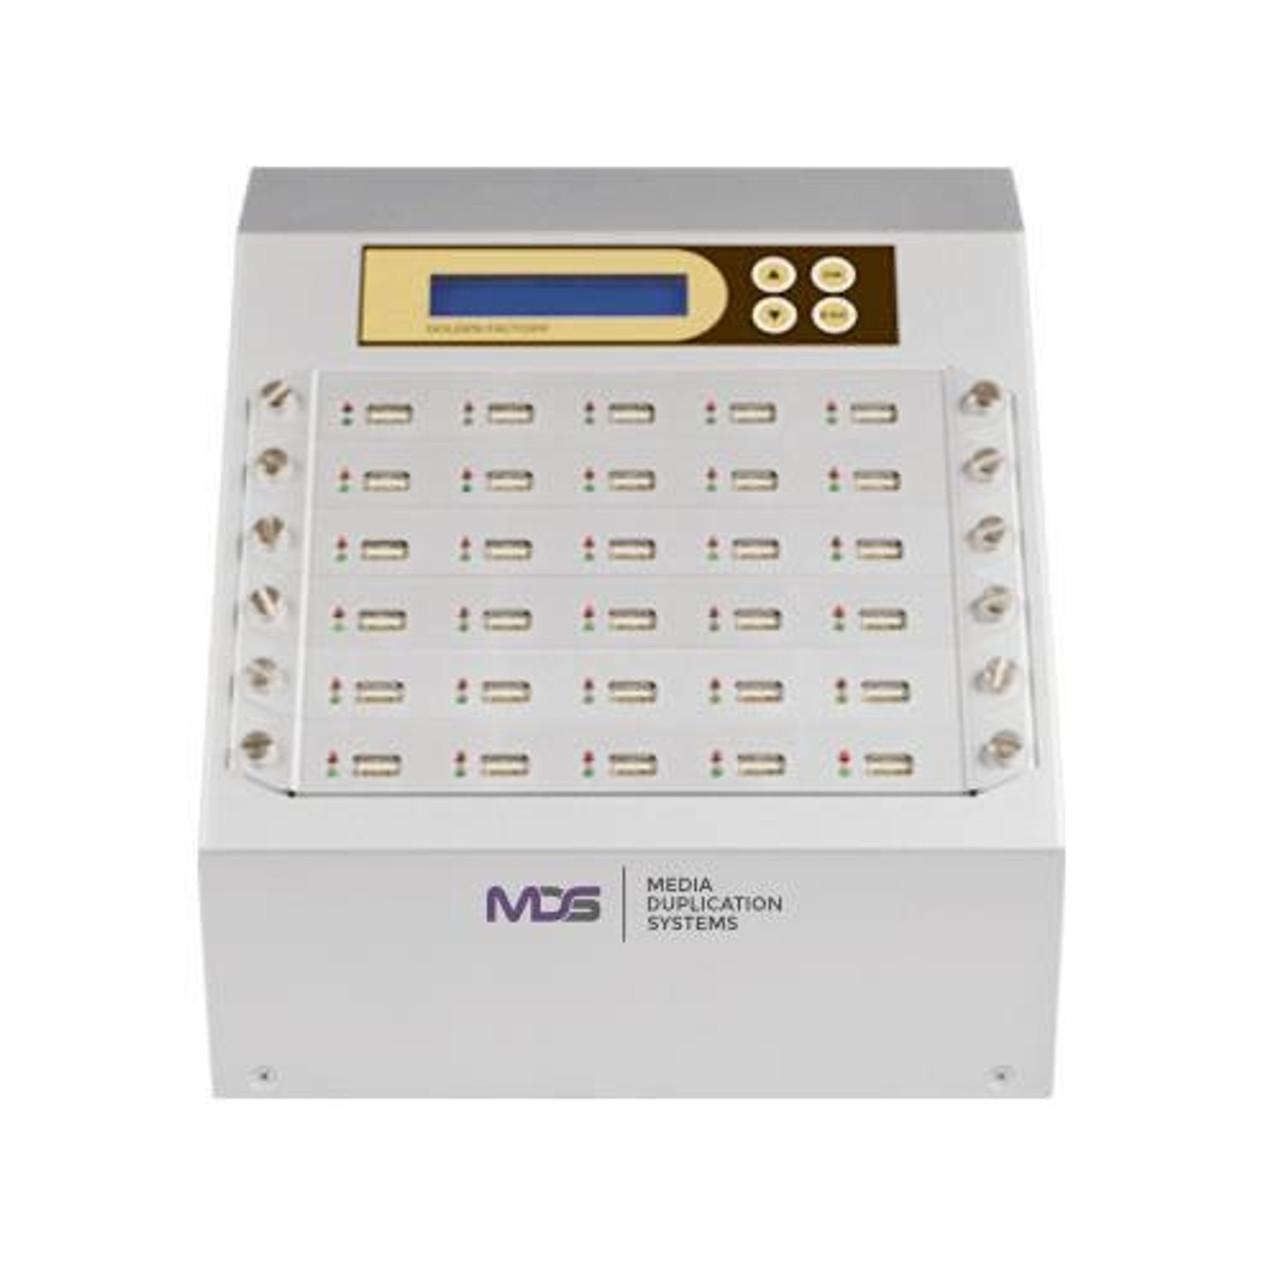 XpressHDD-Pro 1 to 29 External/Portable USB HDD/SSD Duplicator